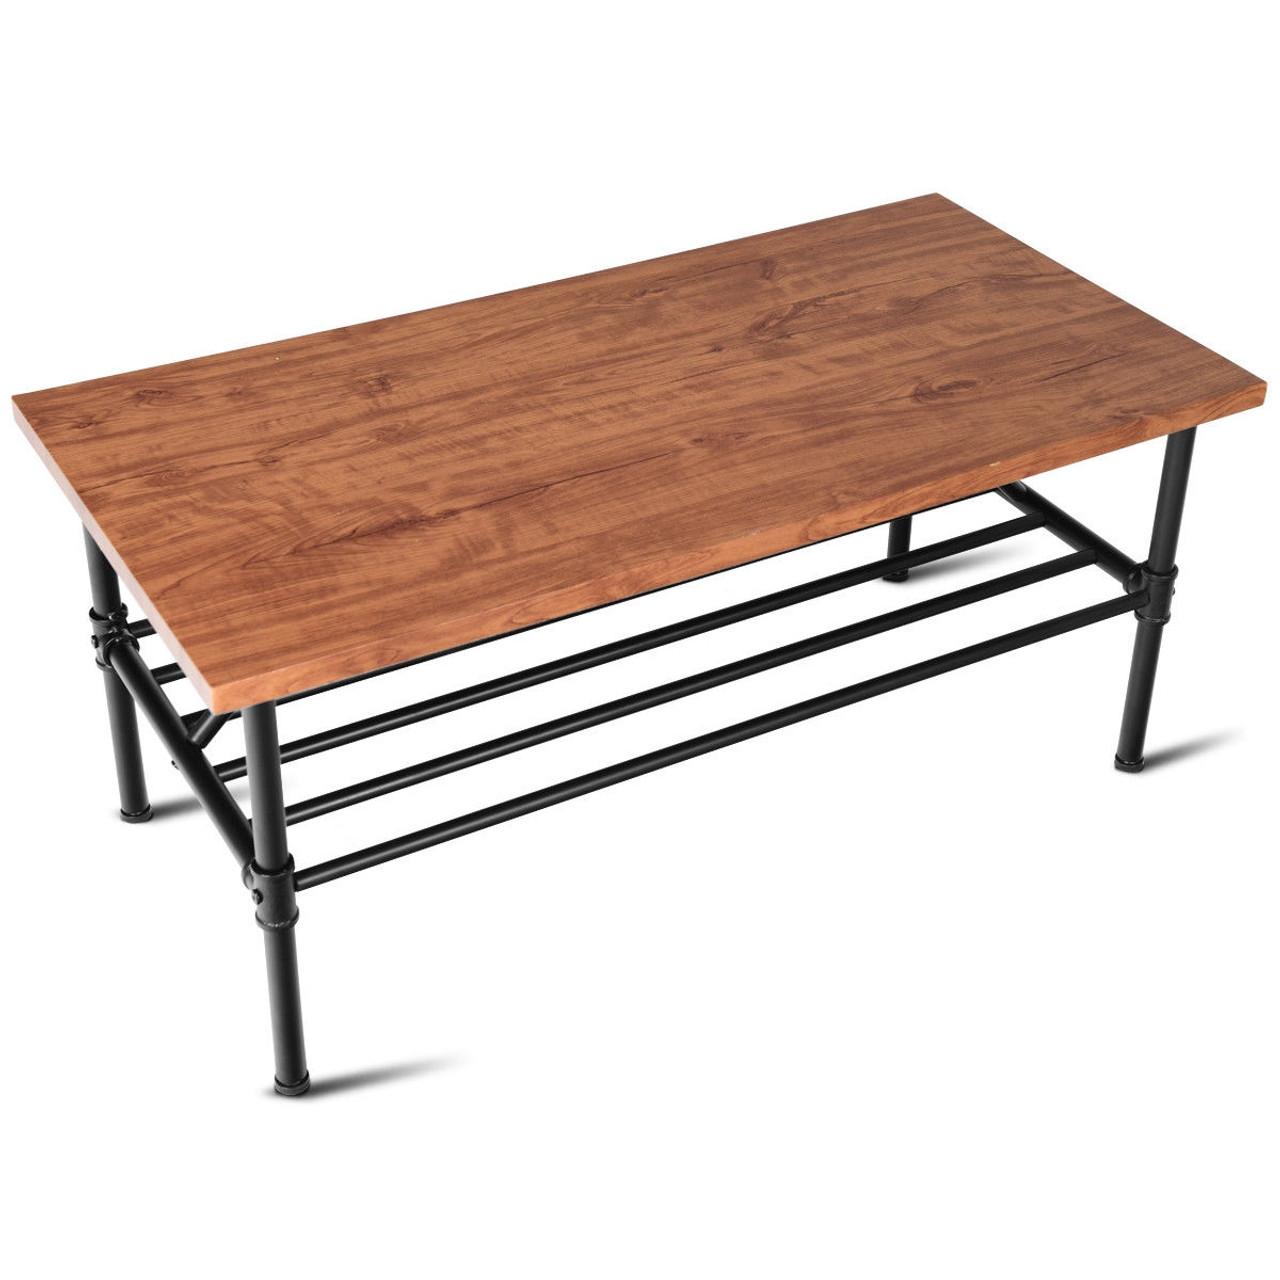 2 tier living room furniture shelf coffee table hw58647